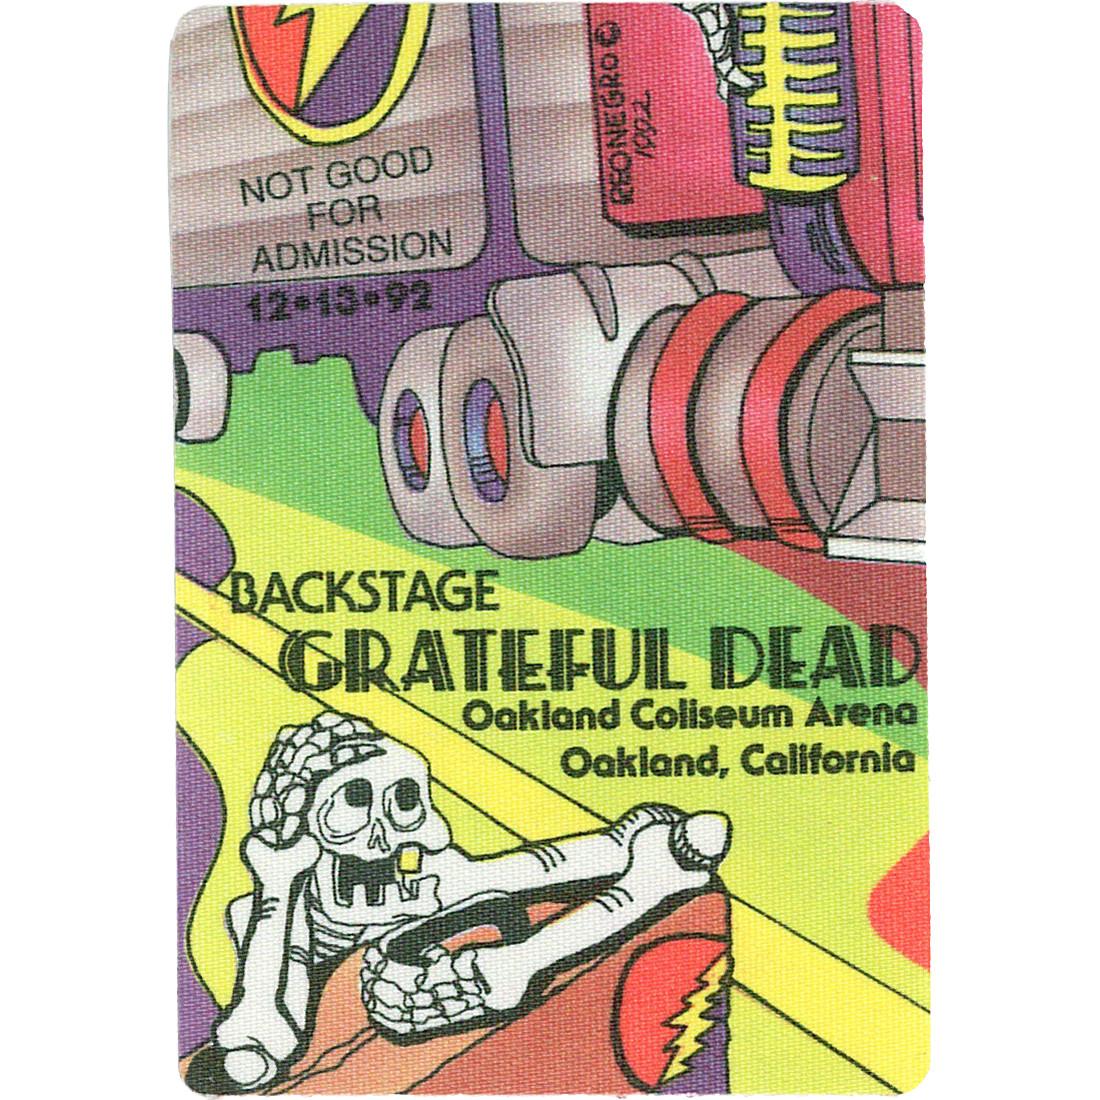 Grateful Dead 1992 12-13 Backstage Pass